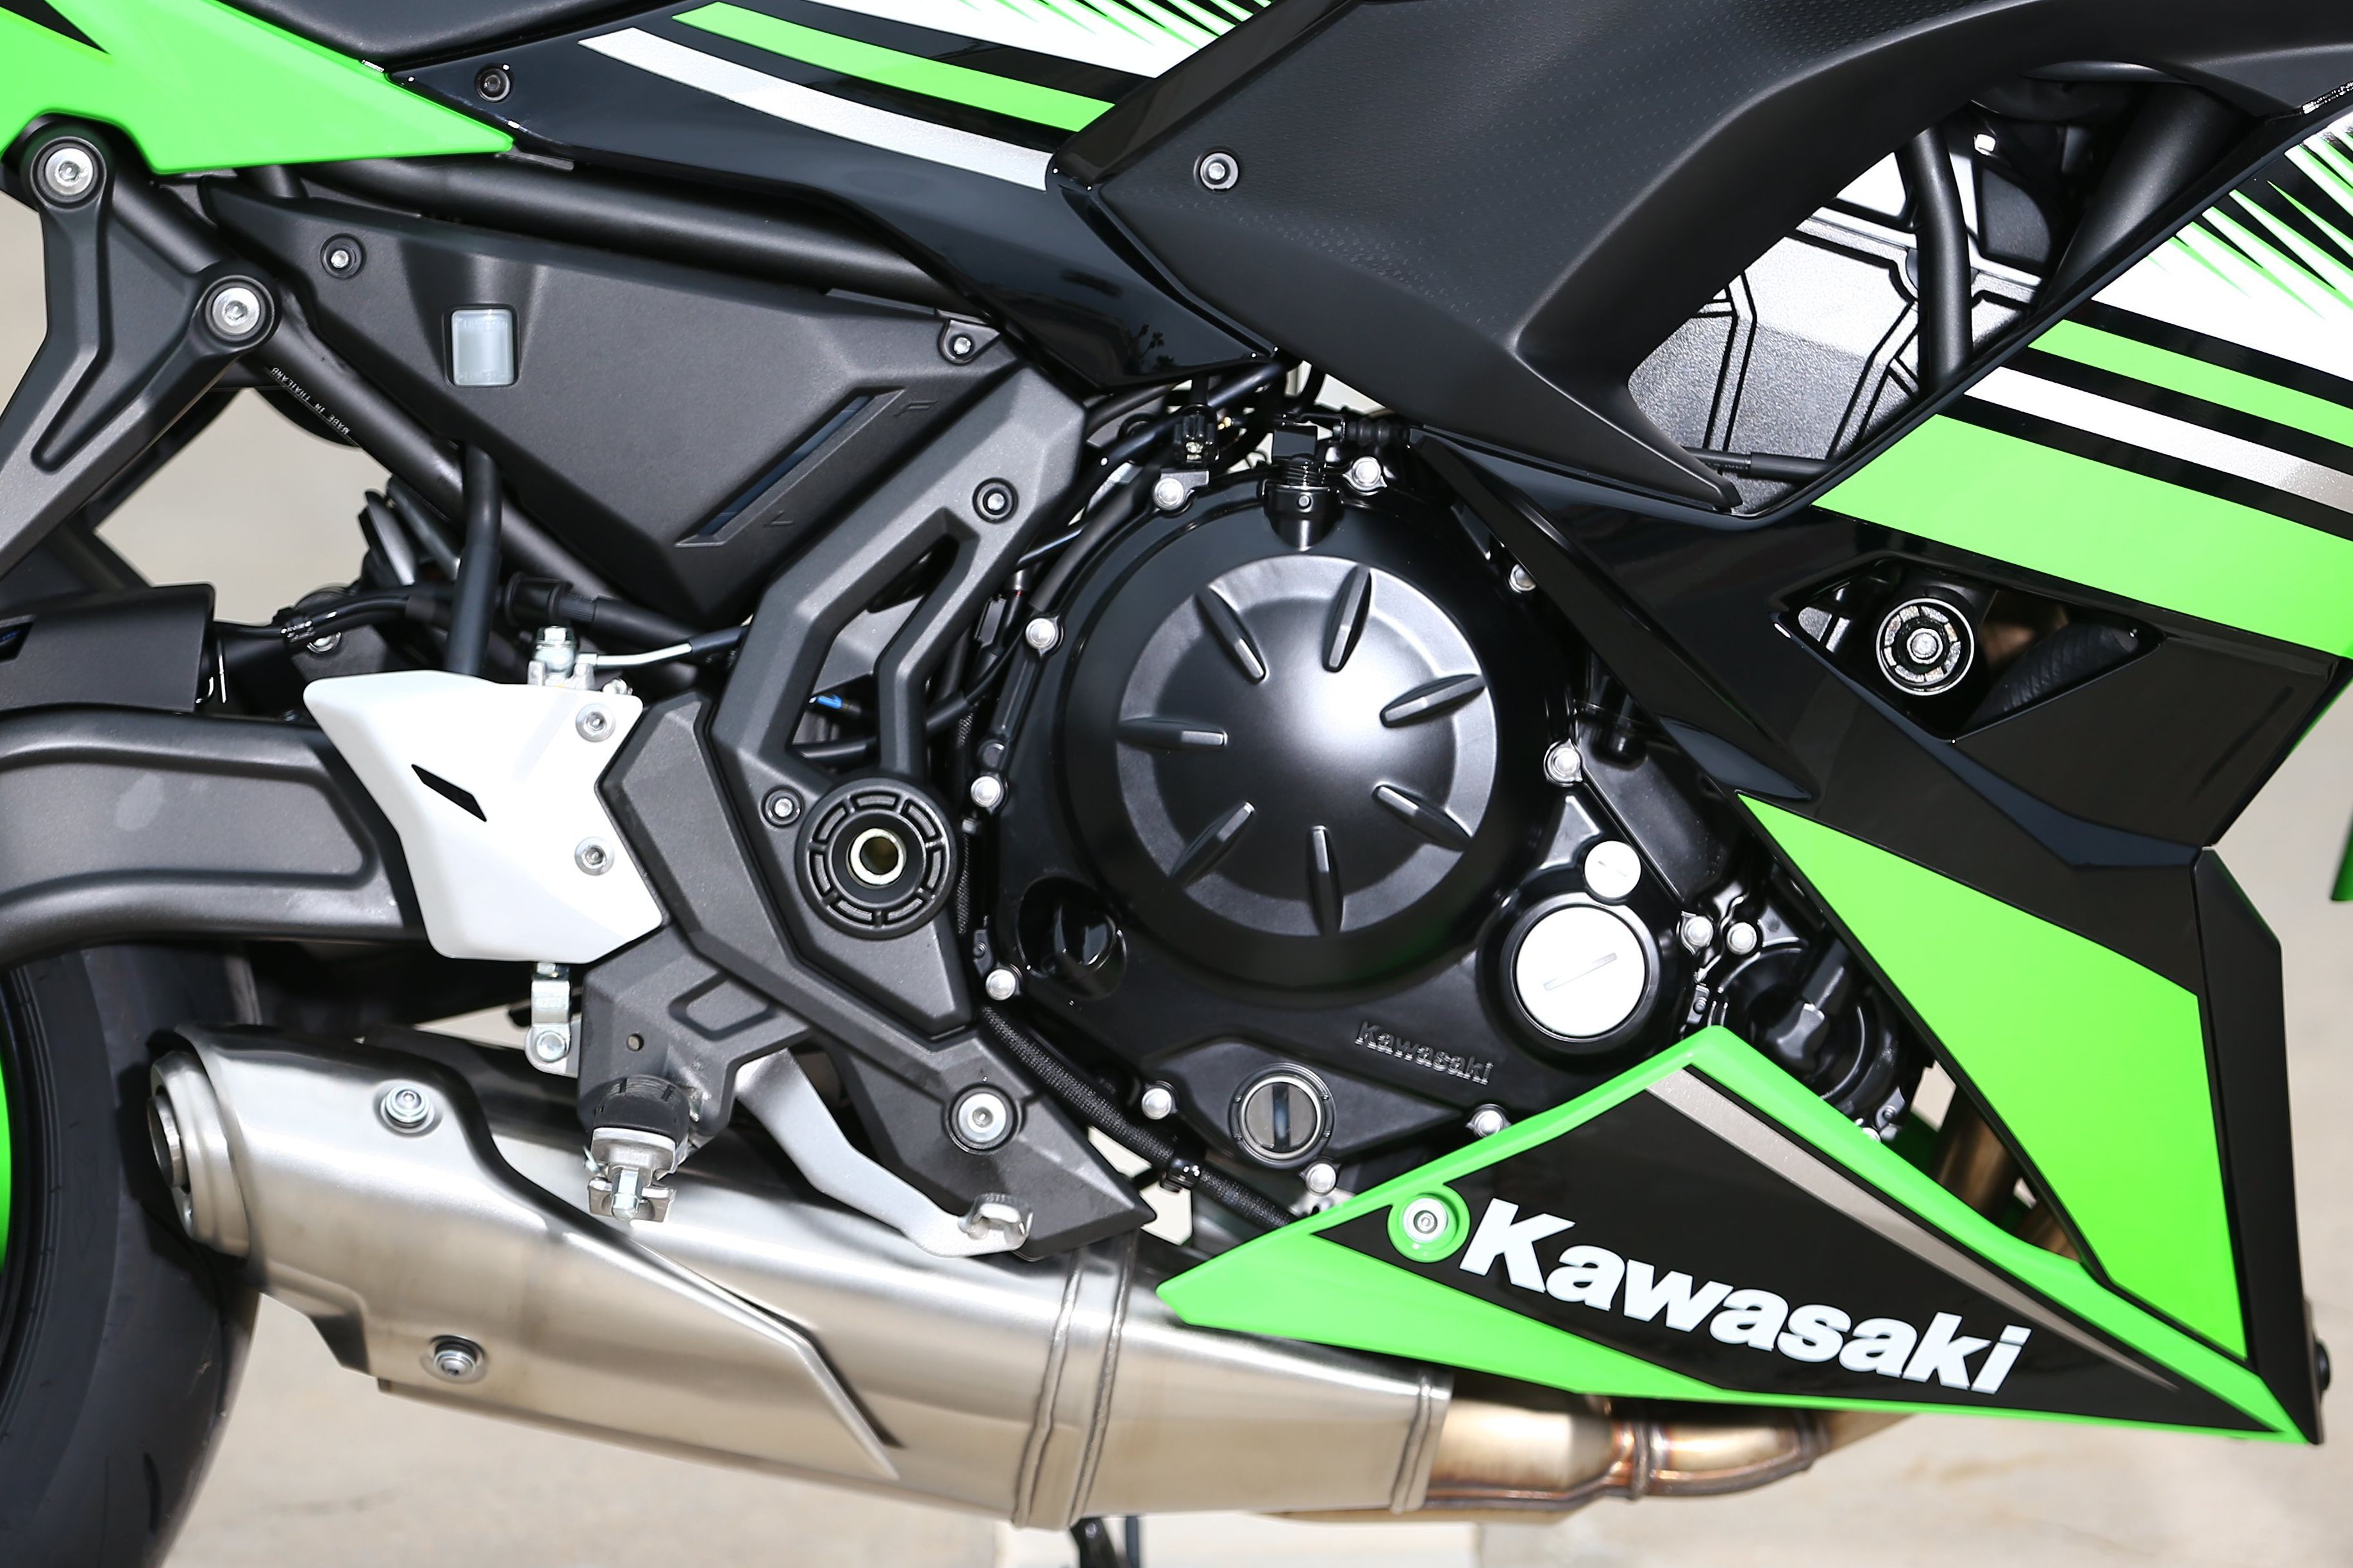 Kawasaki Ninja 650 engine